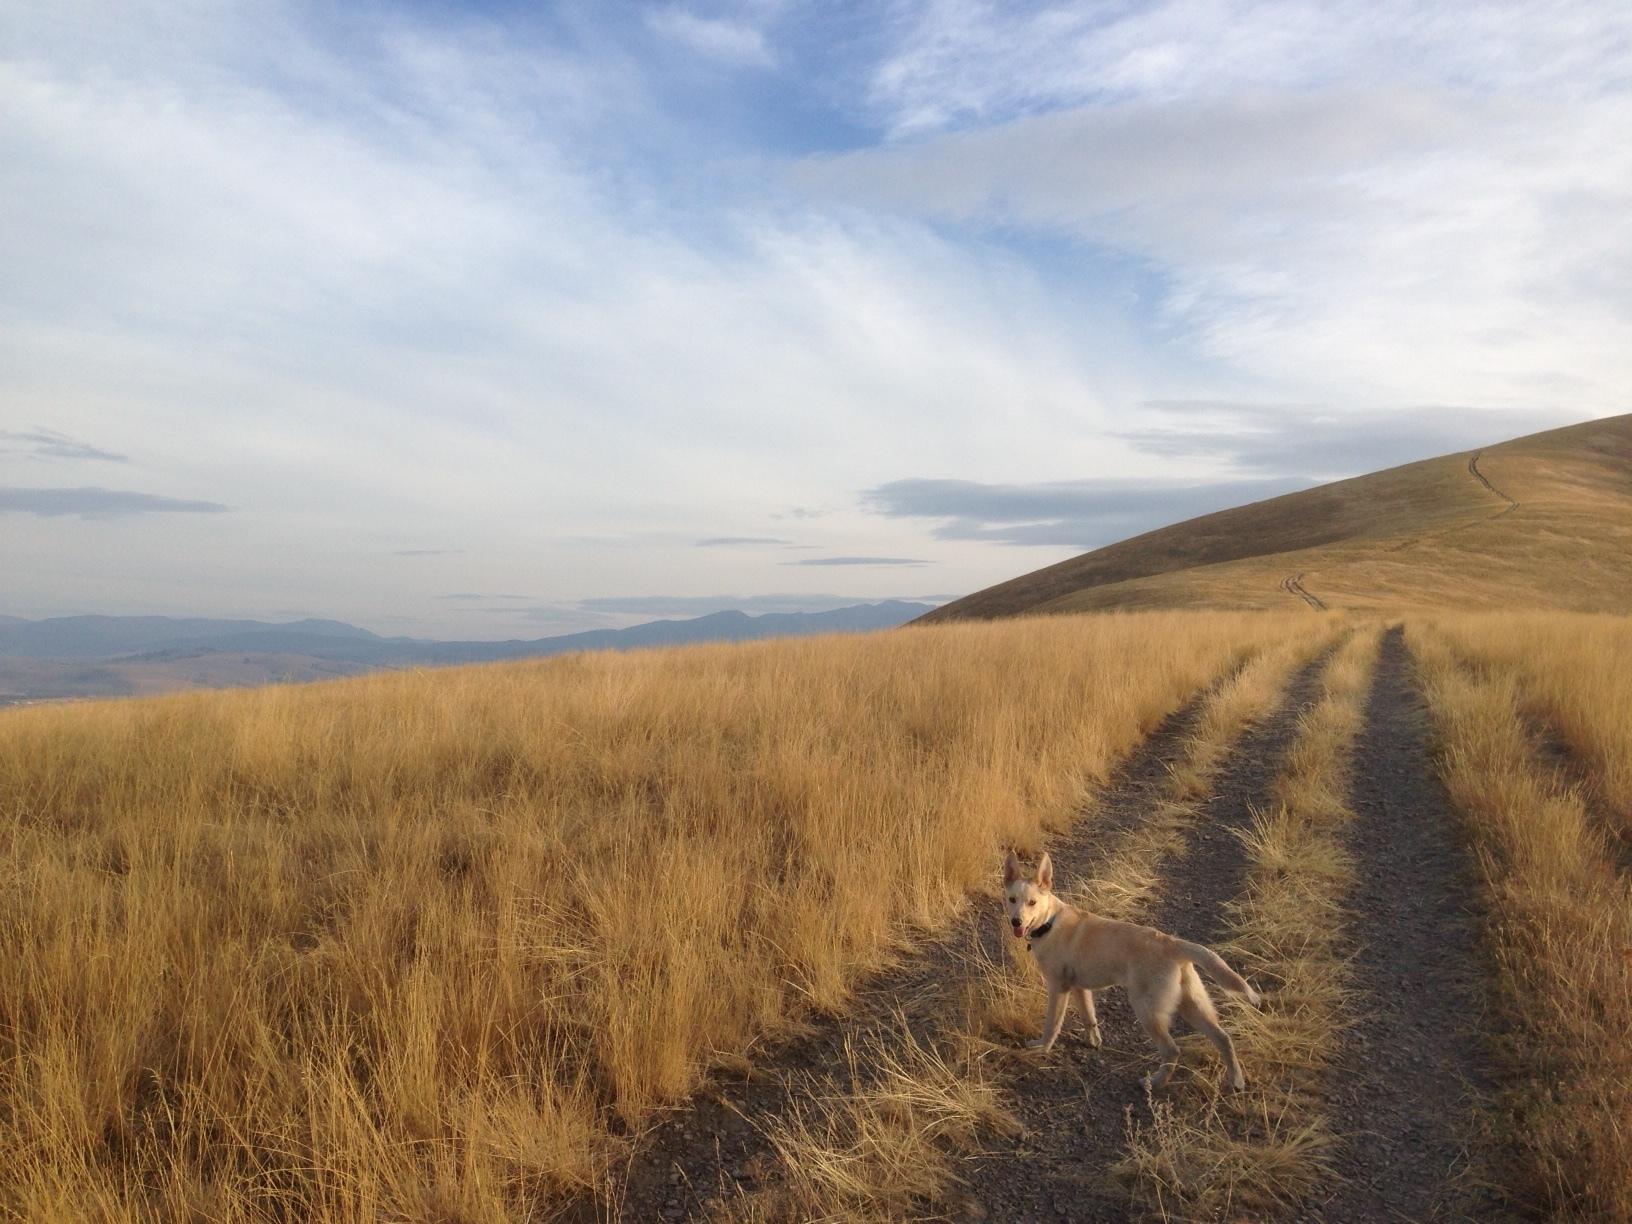 Dog-walking on Mount Sentinel in fall